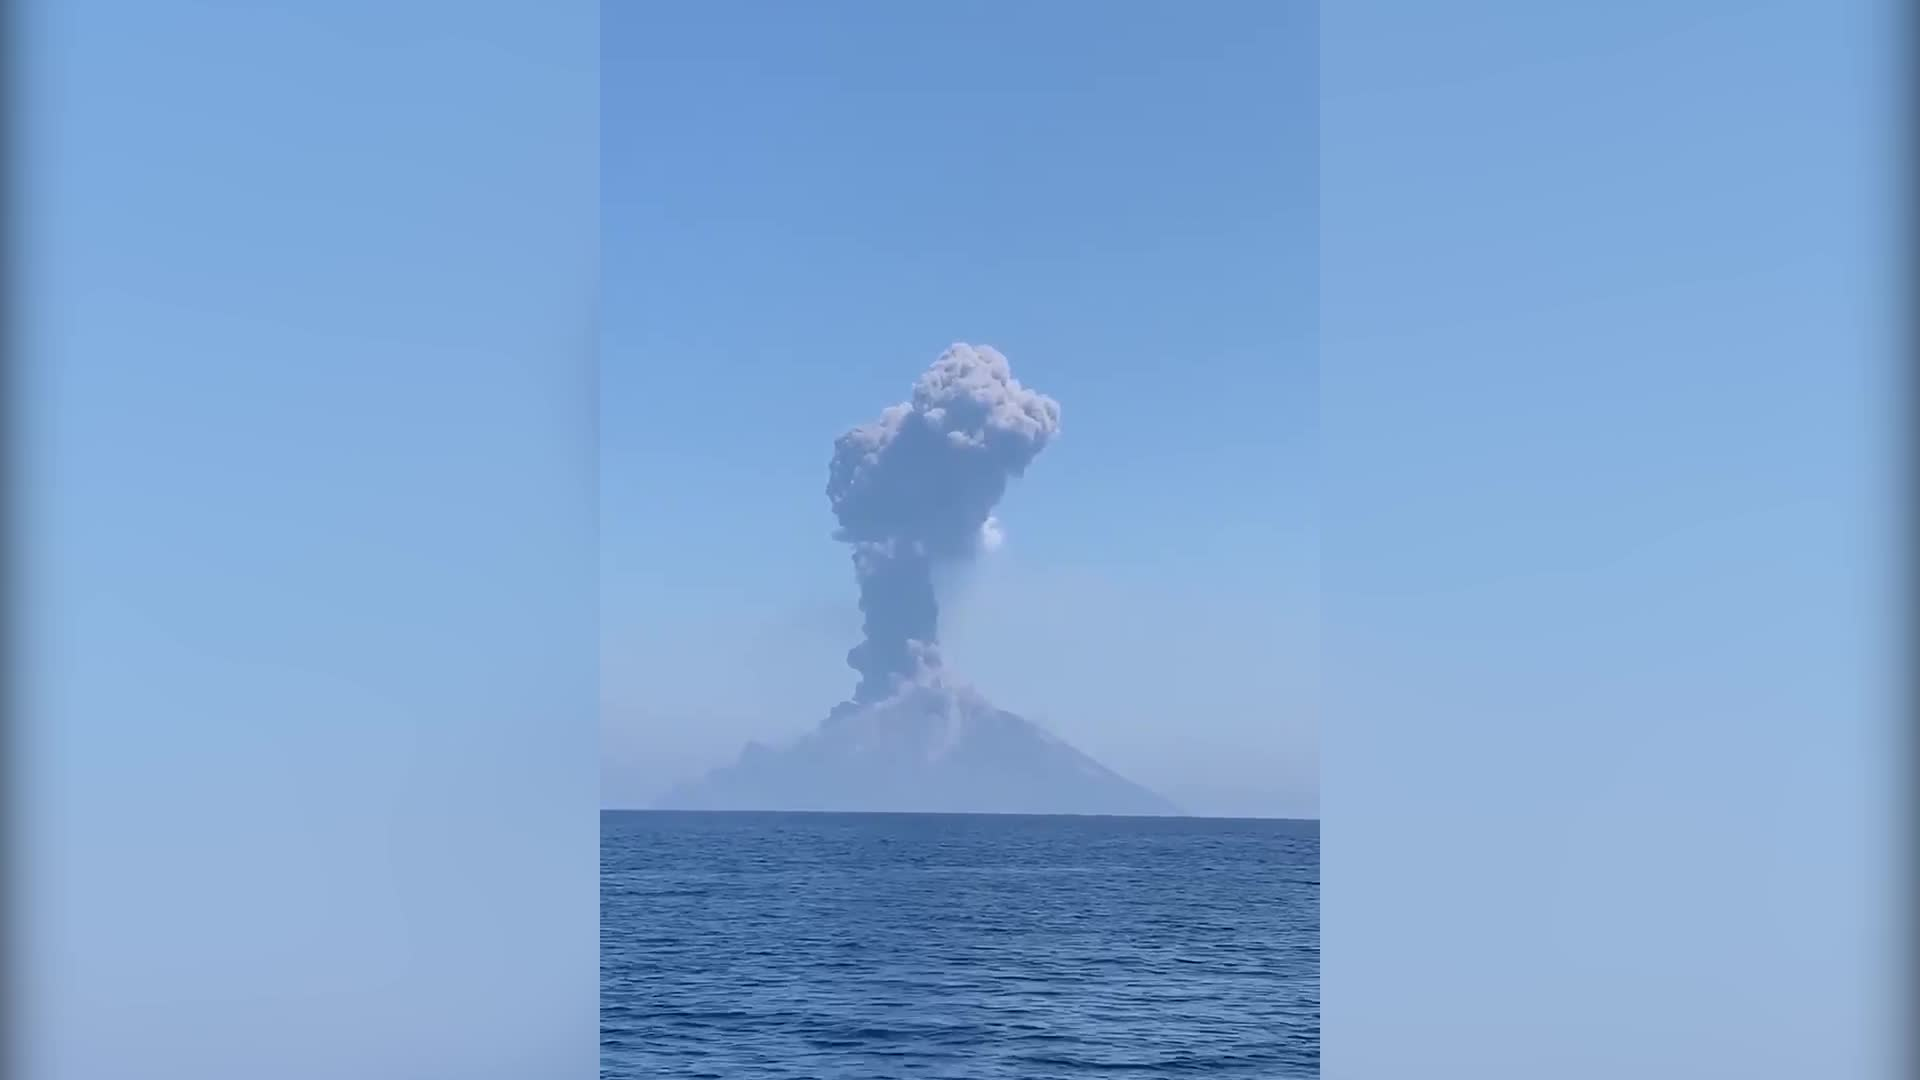 Volcanic Cloud Surges Toward Fleeing Boat After Stromboli Eruption